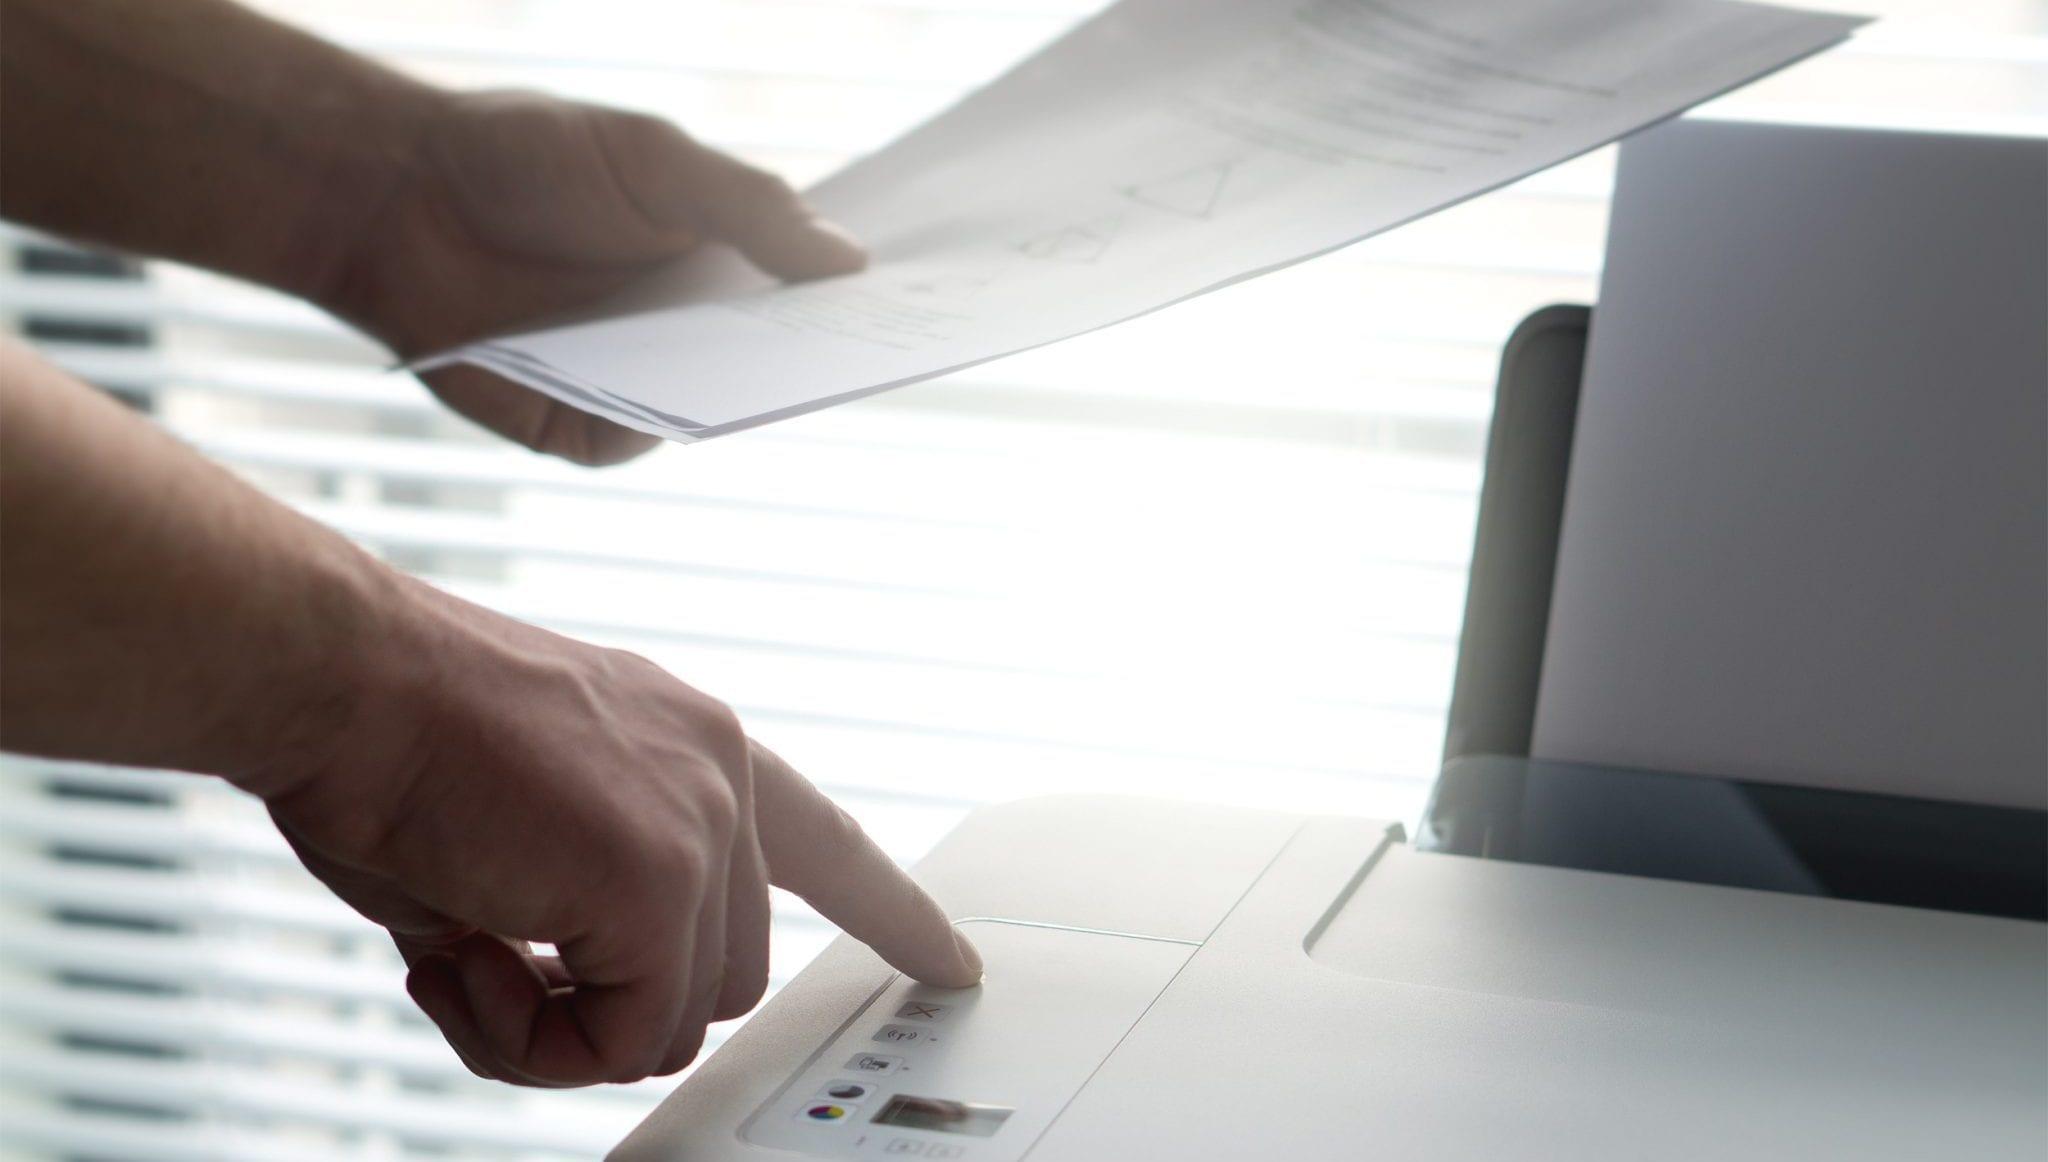 coworking printer